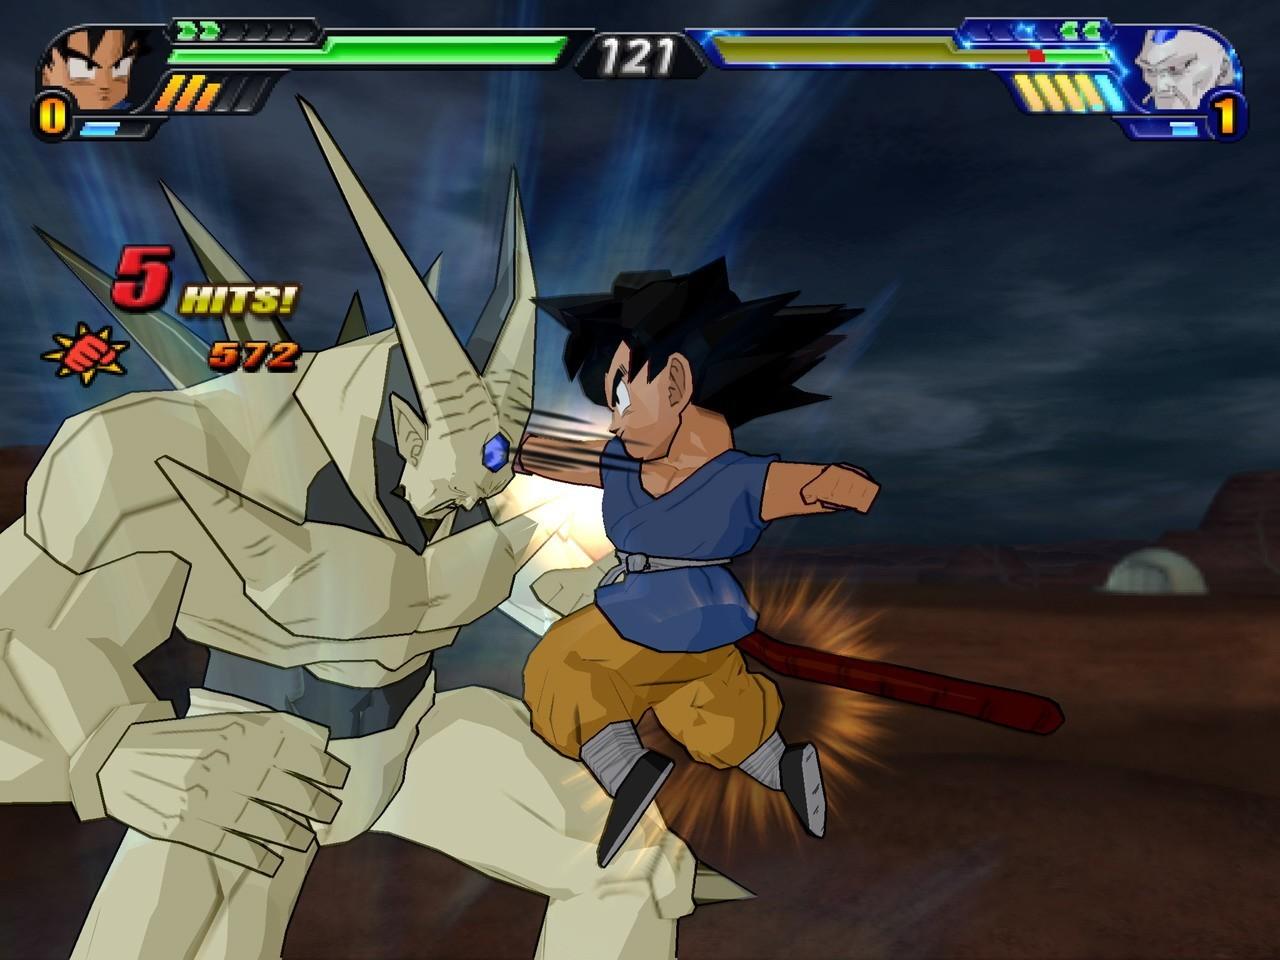 http://i.jeuxactus.com/datas/jeux/d/r/dragon-ball-z-budokai-tenkaichi-3/xl/dragon-ball-z-budo-4e266964d9796.jpg